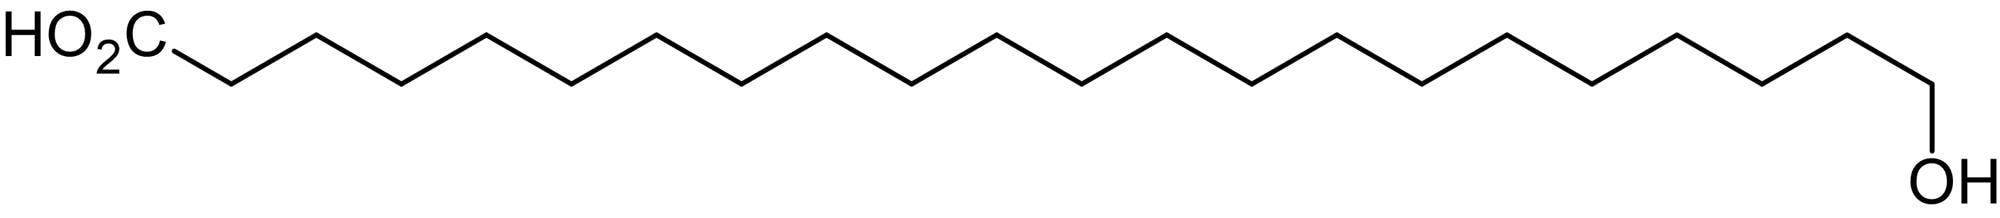 Chemical Structure - 22-Hydroxydocosanoic acid (Omega-Hydroxybehenic acid), omega-Hydroxy C22:0 fatty acid (ab144073)